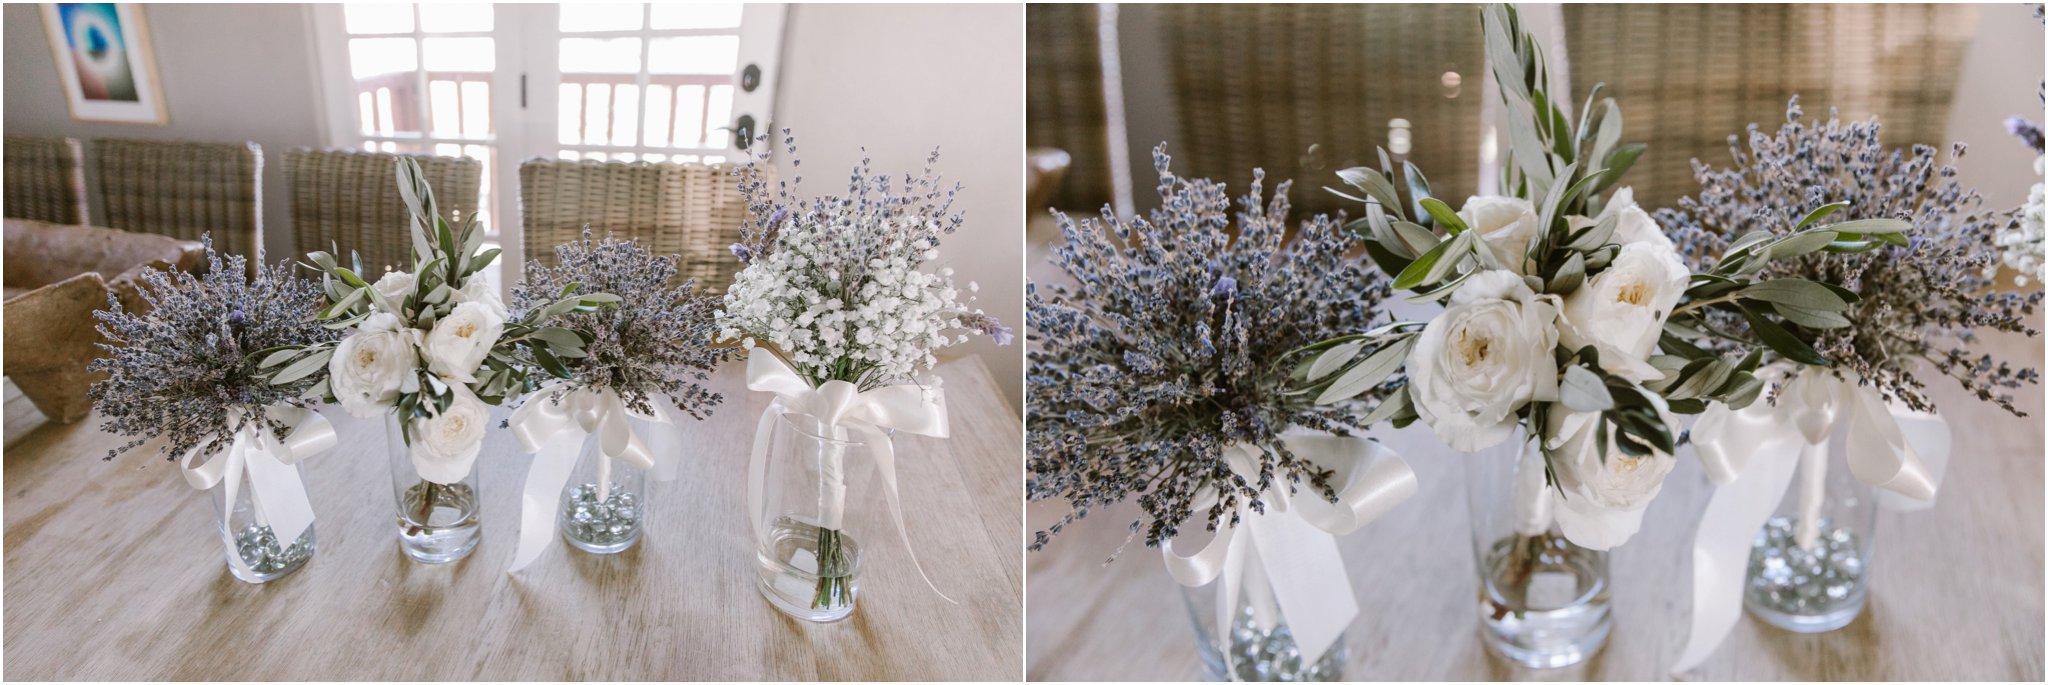 0003Blue Rose Photography_ Inn and Spa at Loretto Wedding_ Albuquerque and Santa Fe Wedding Photographer_ New Mexico Wedding Photography